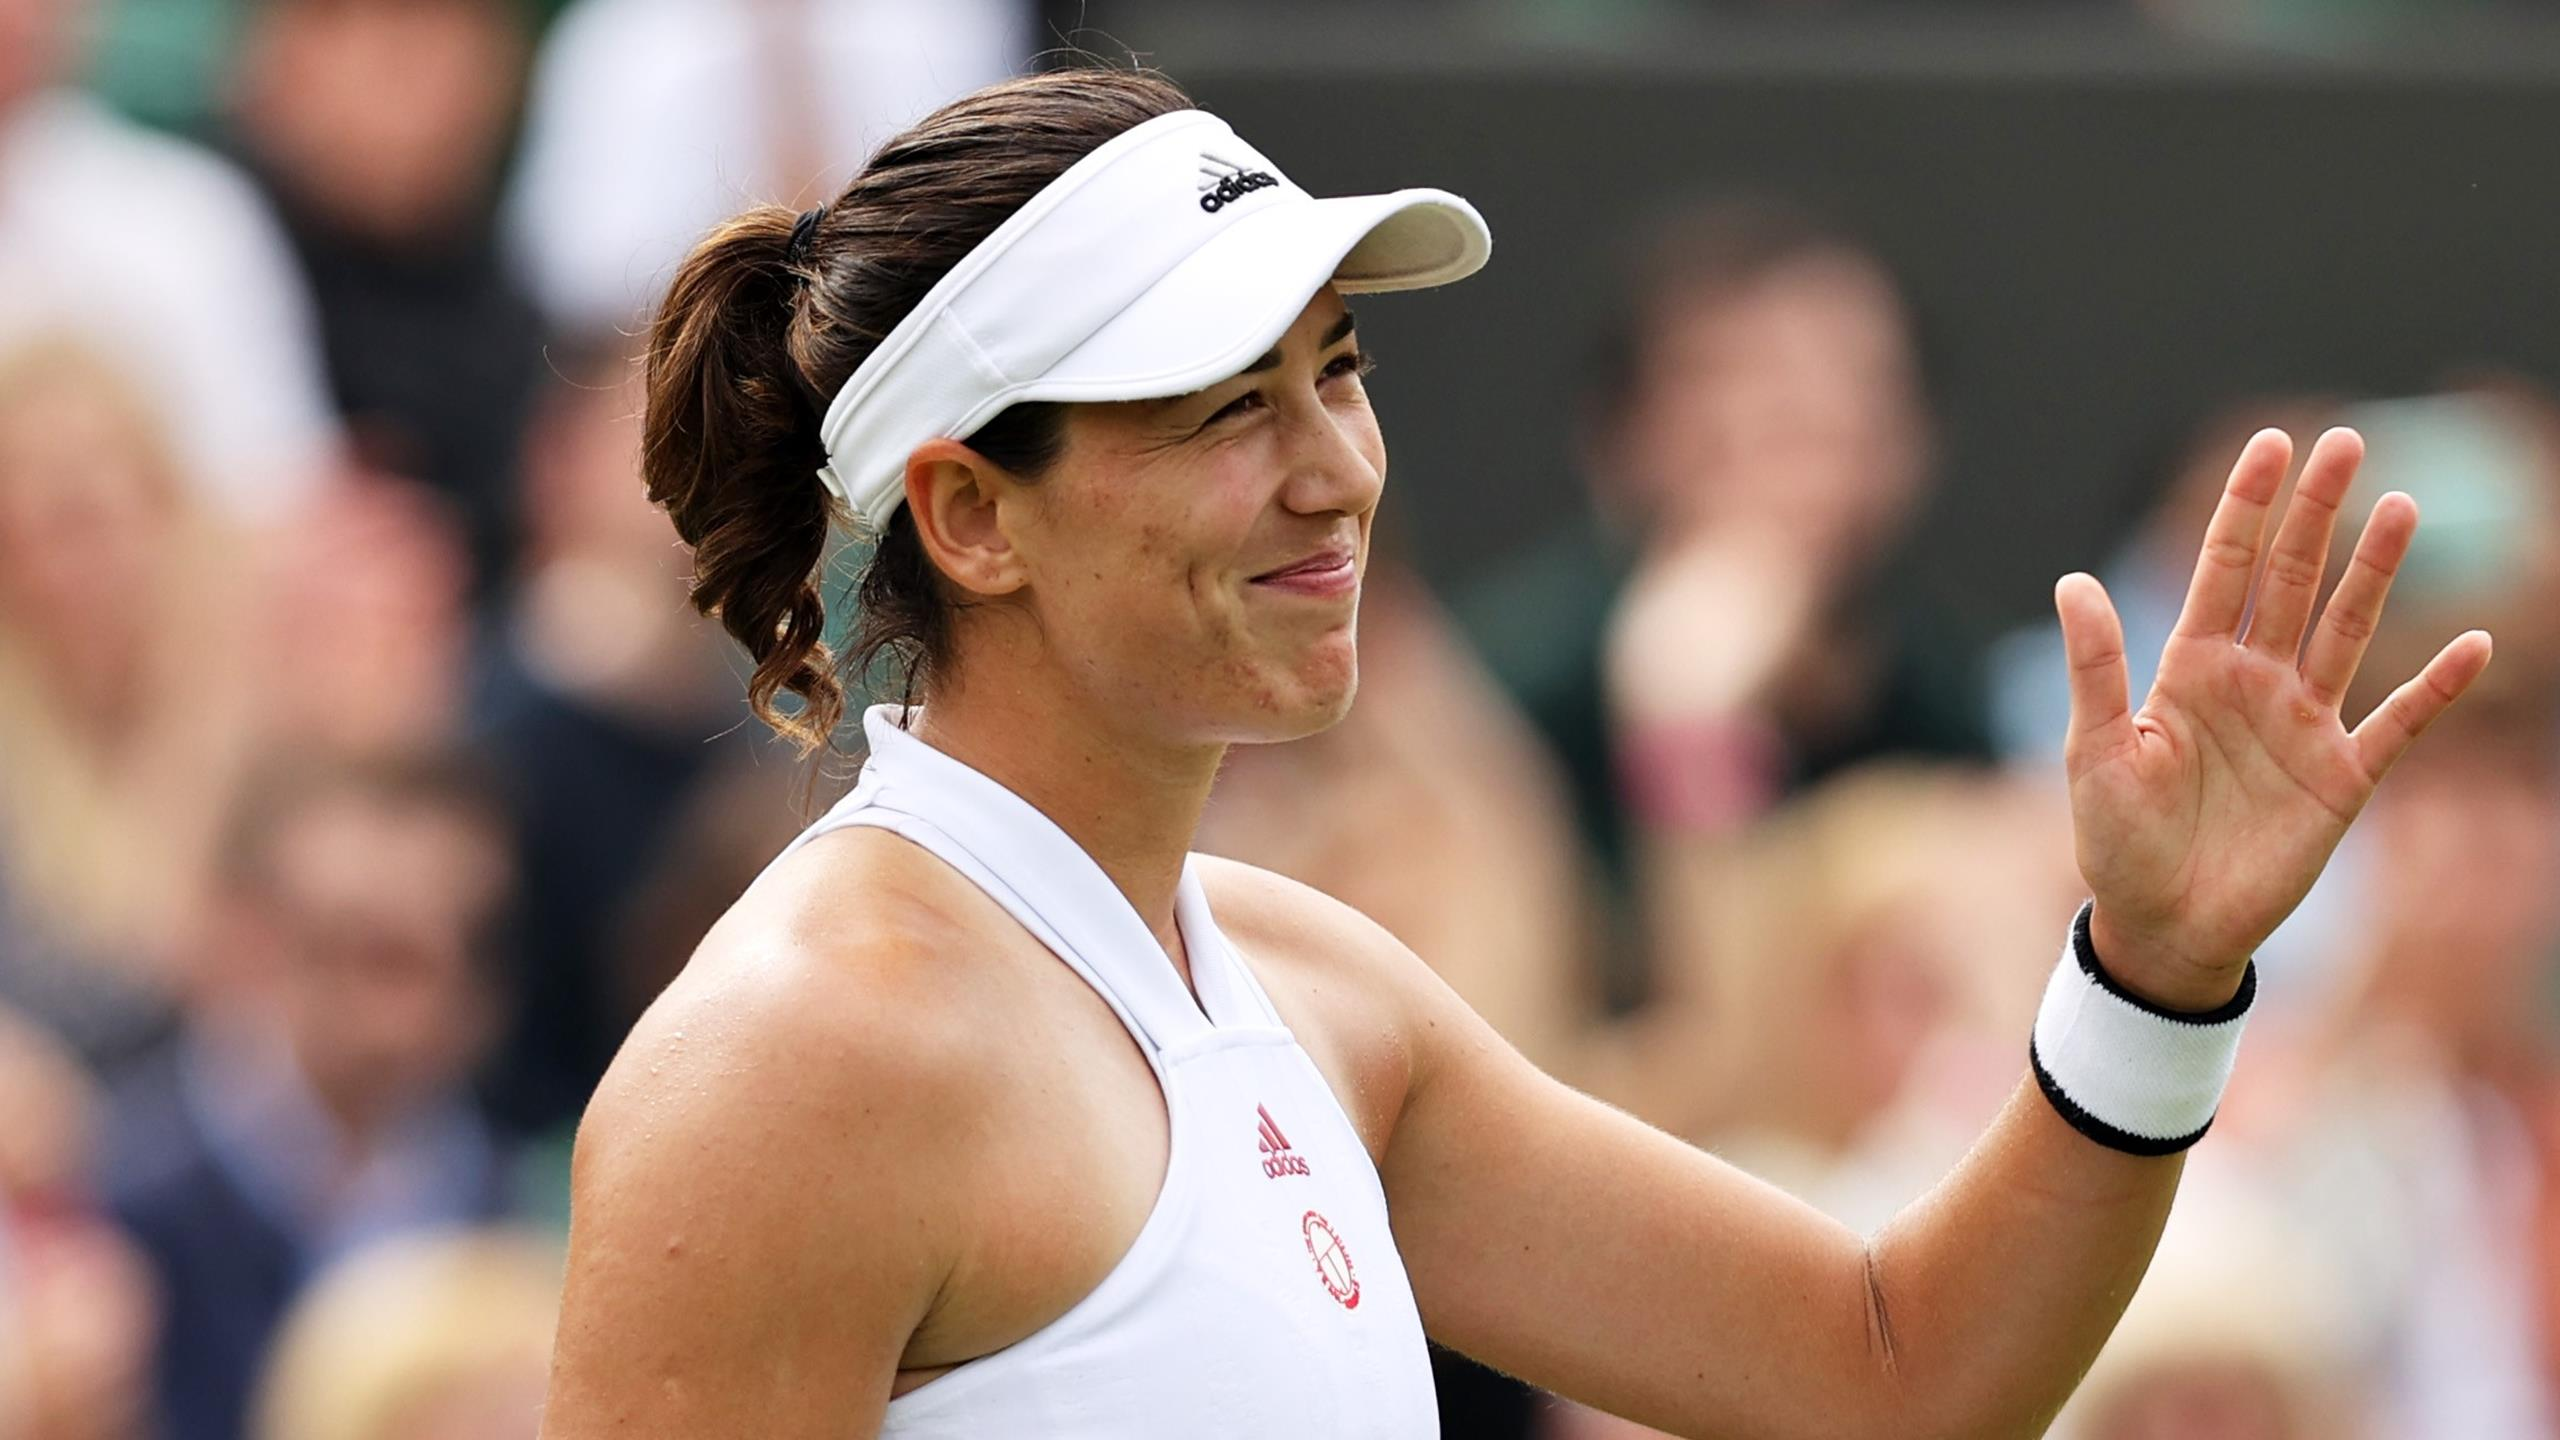 Wimbledon Championships 2021: Garbine Muguruza vs. Lesley Kerkhove Tennis Pick and Prediction